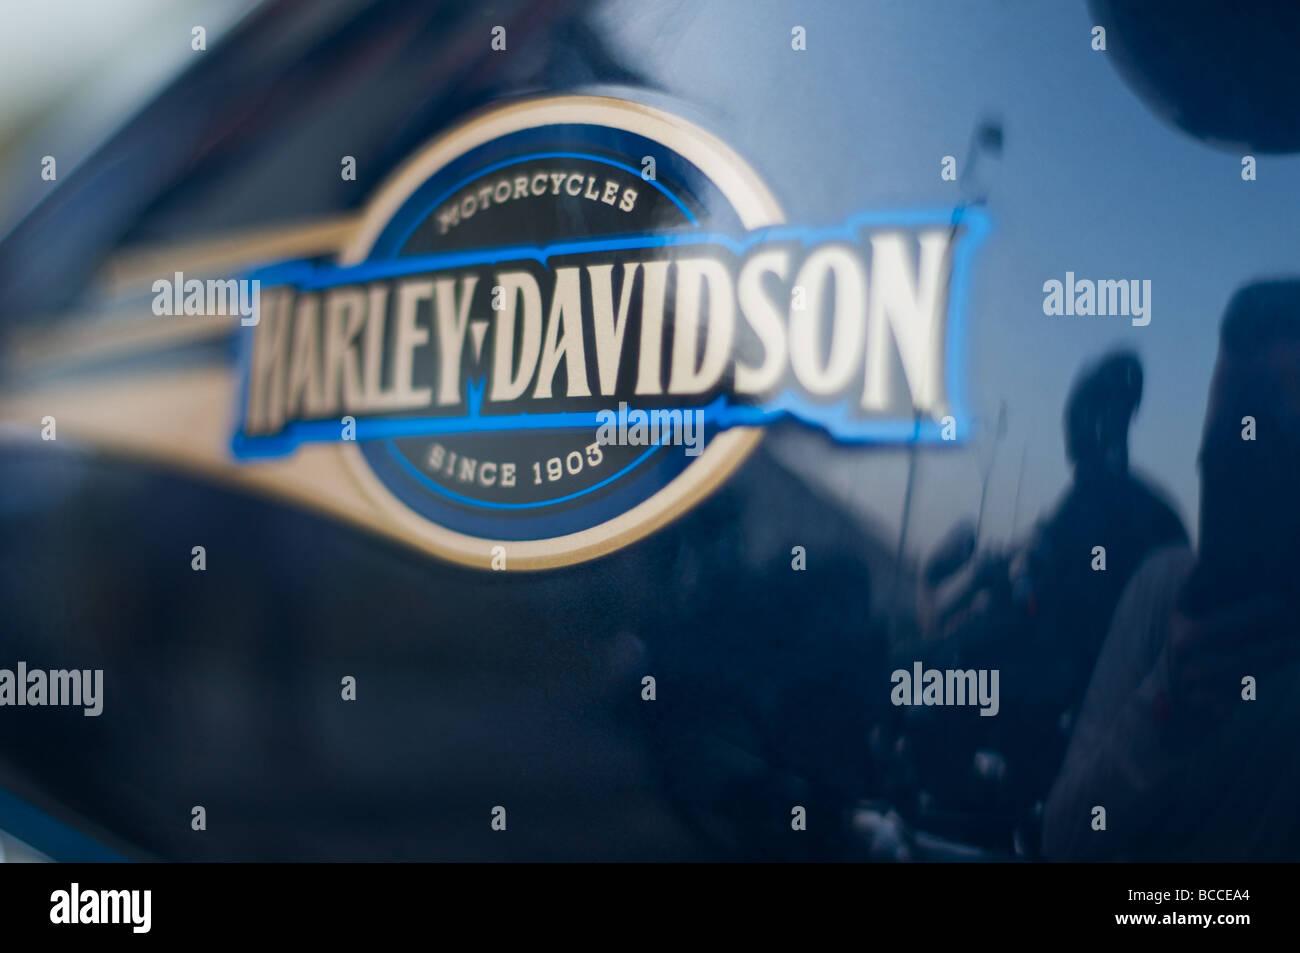 Harley Davidson motorbikes in Dubai - Stock Image